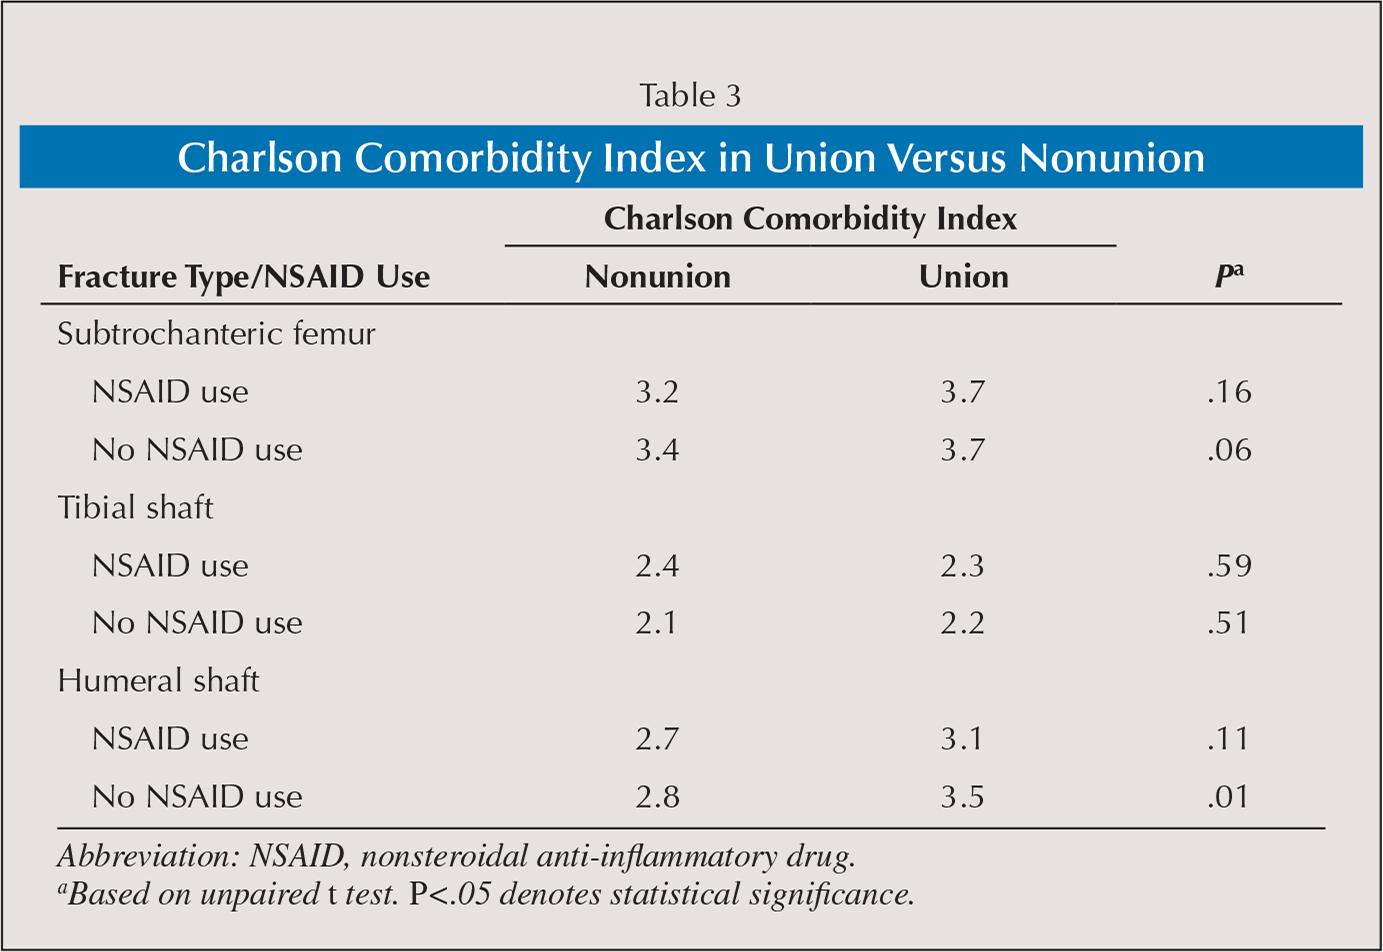 Charlson Comorbidity Index in Union Versus Nonunion